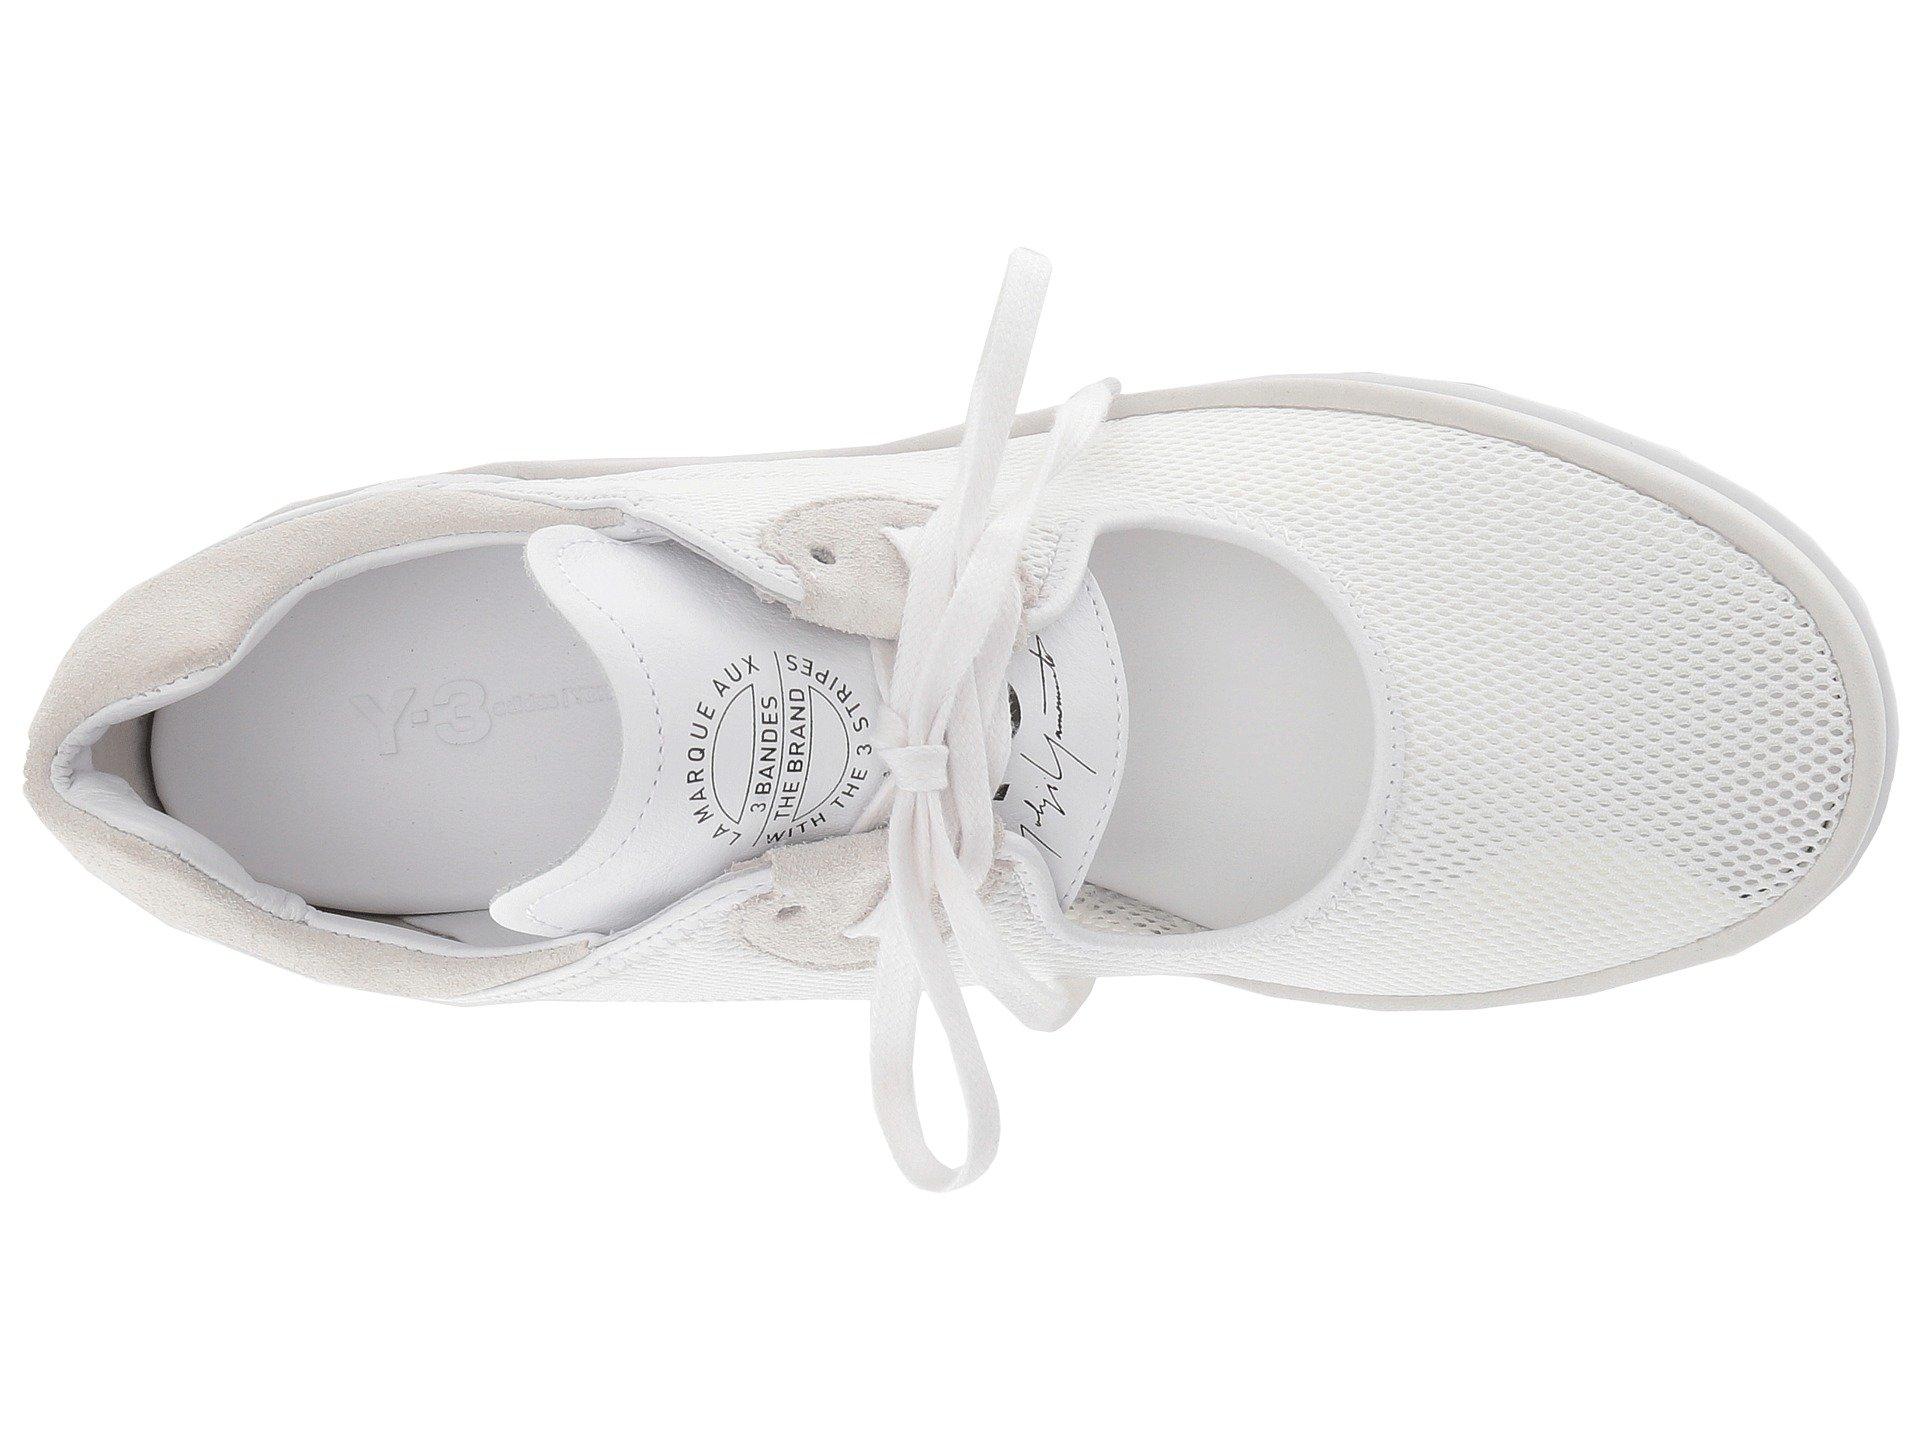 By 3 Yohji Stan footwear Black Adidas Wedge Yamamoto core Y Footwear White White 1EqTwH